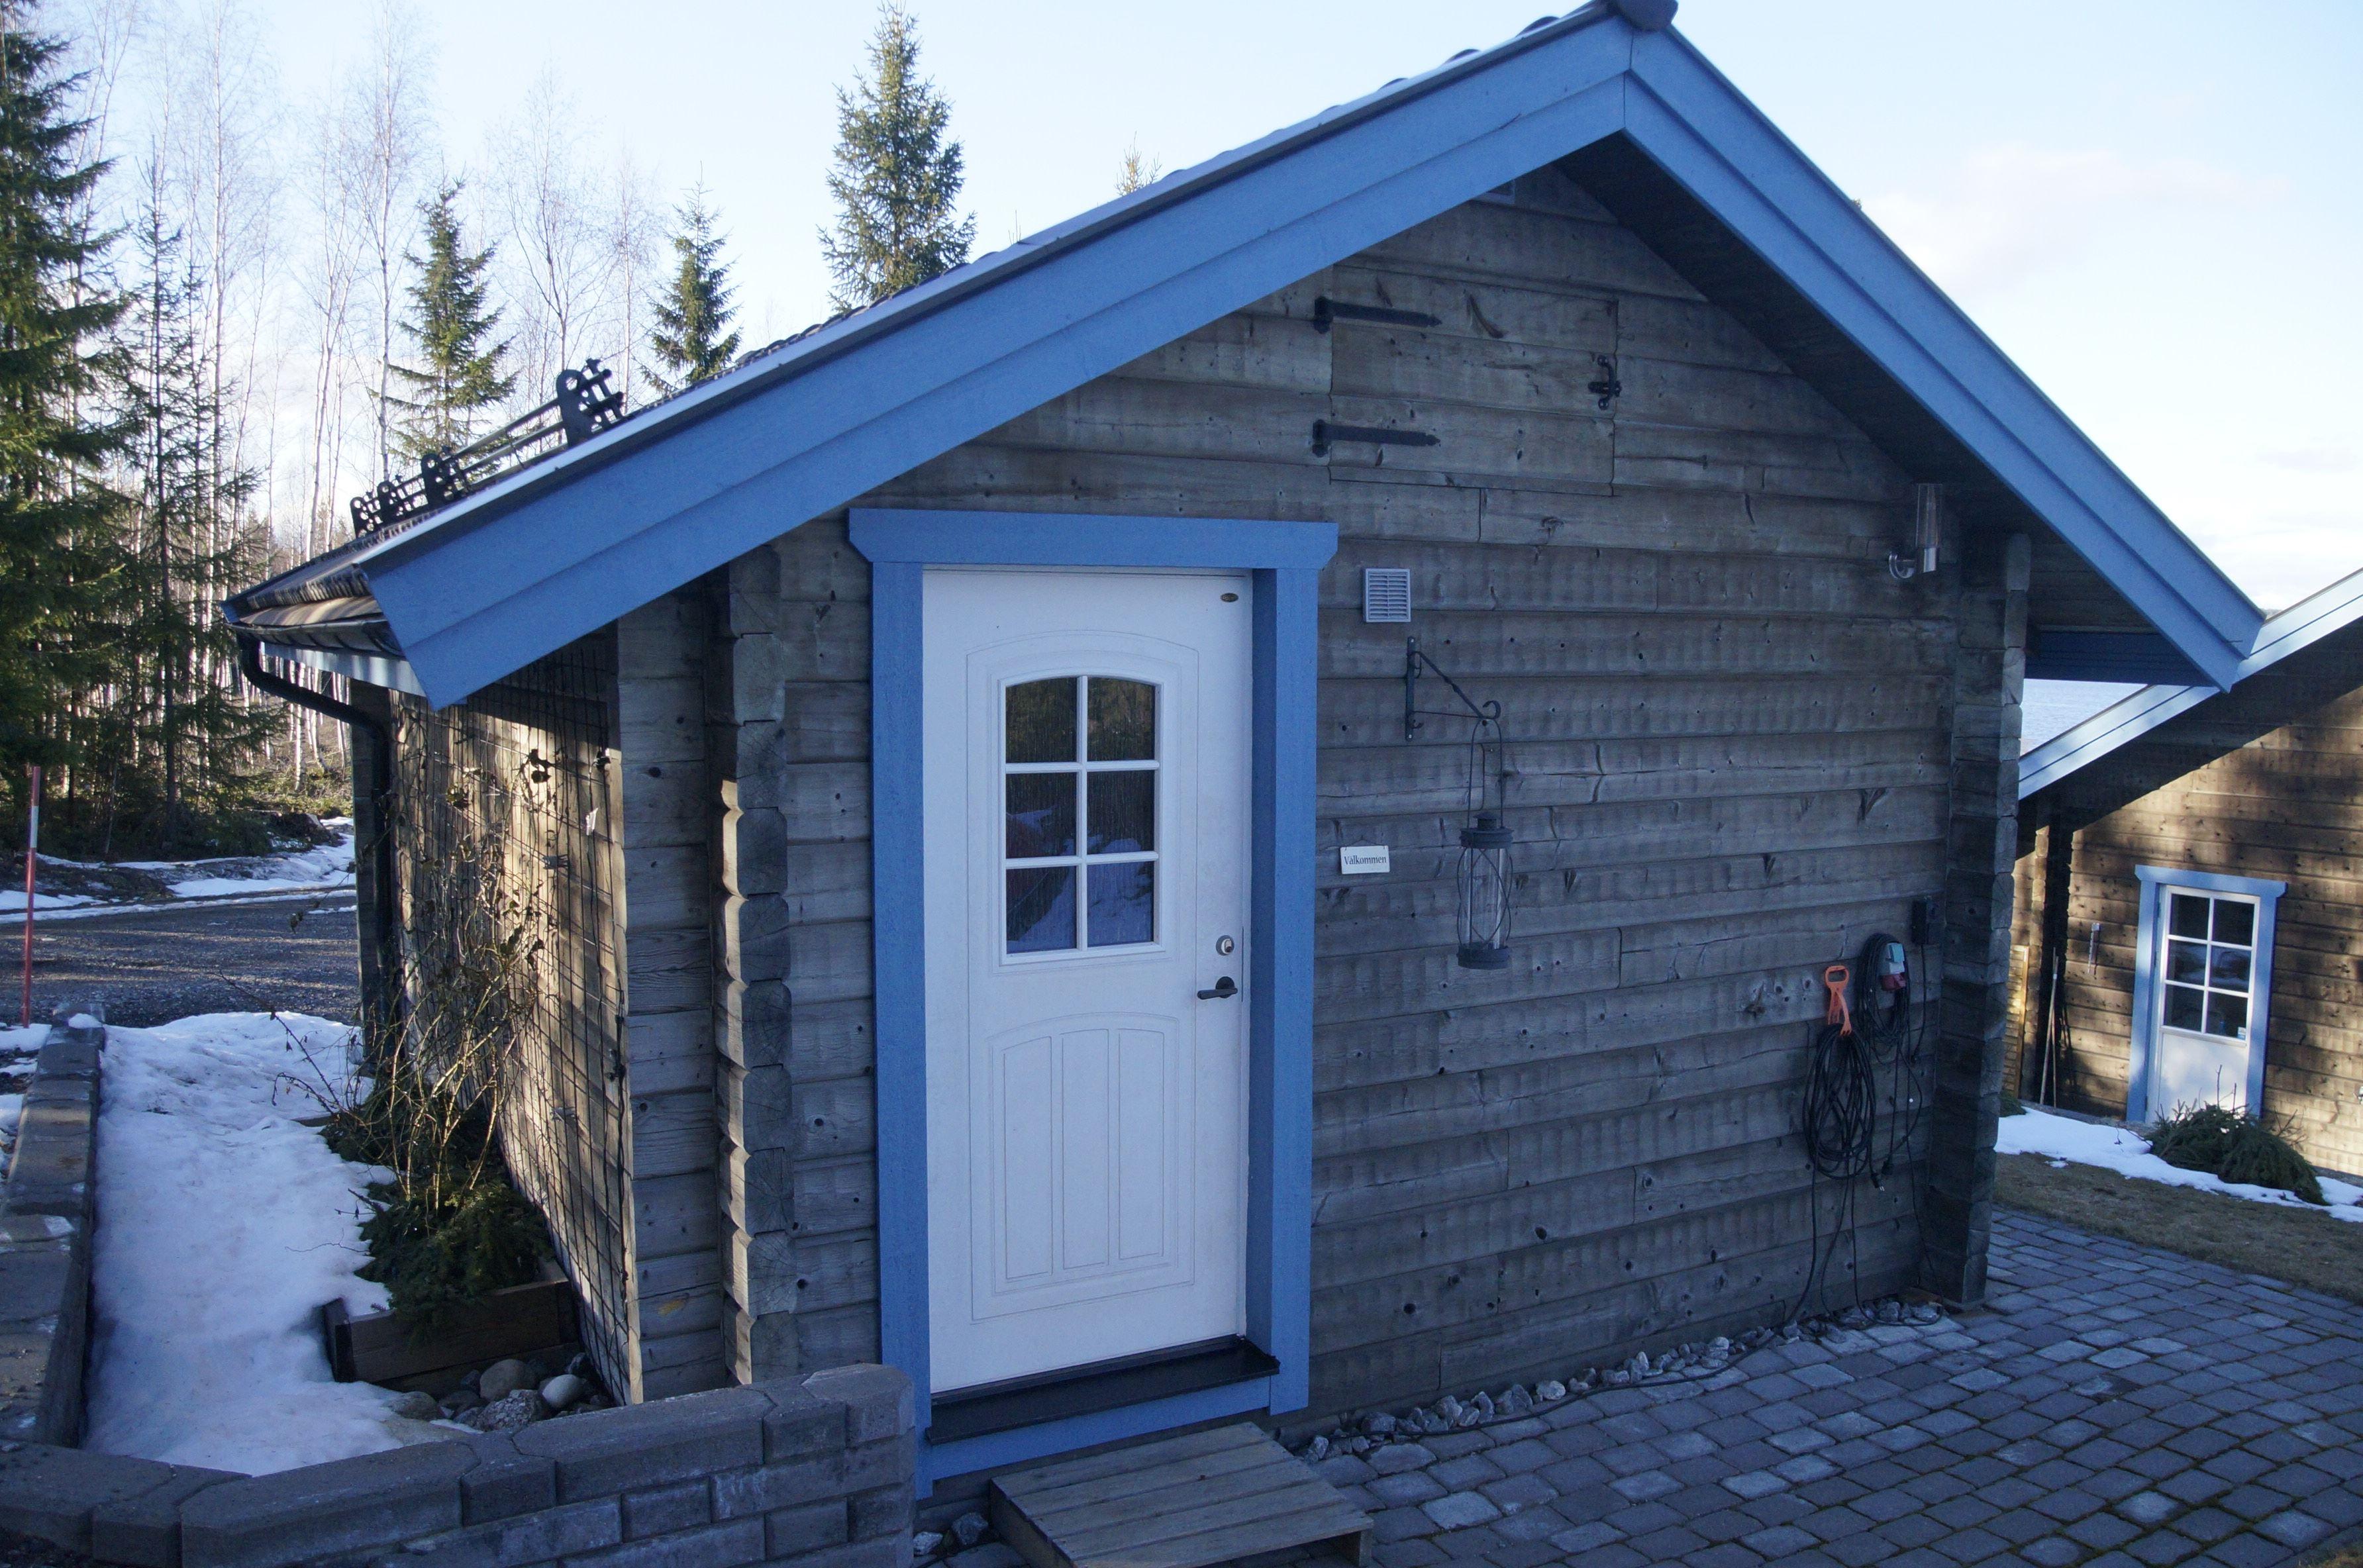 S1305 Nötbolandet, Örnsköldsvik